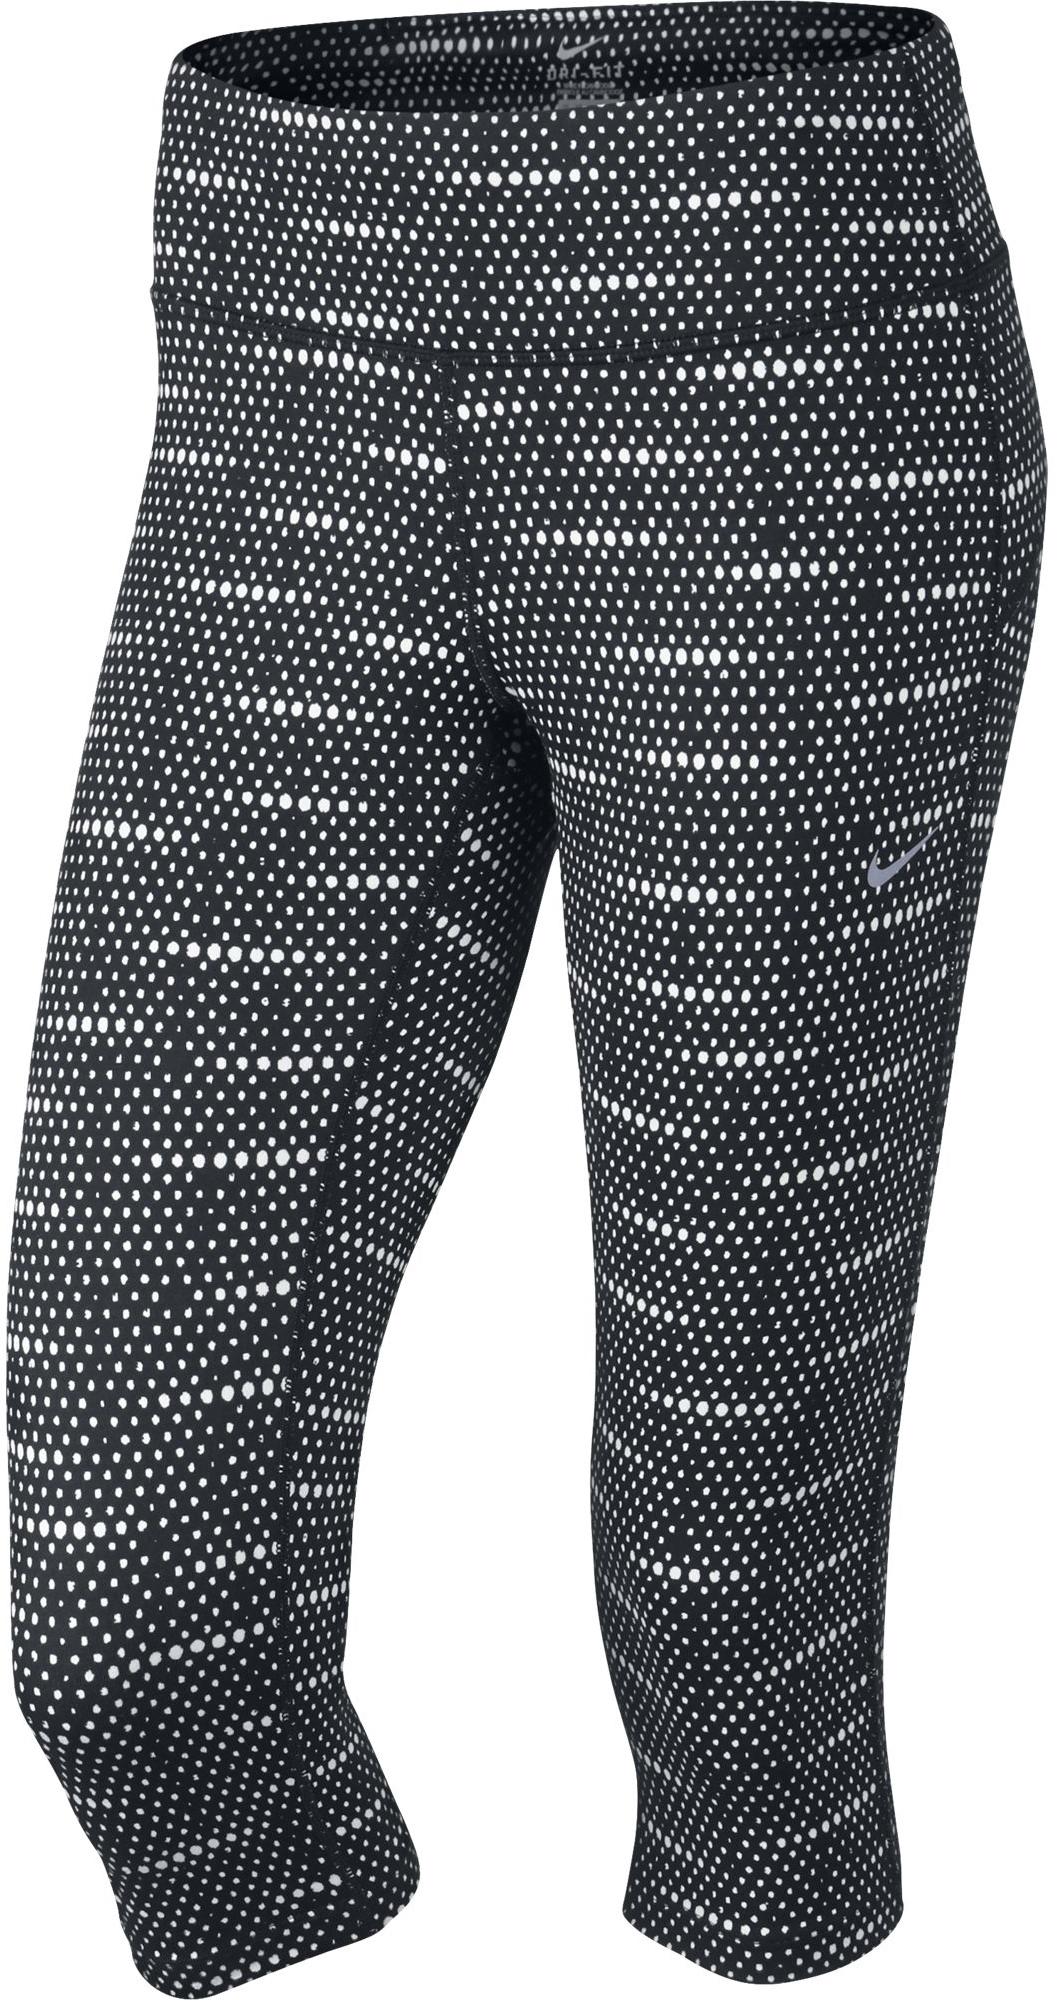 c880d7177d599 Nike Dri-Fit Printed Epic Run Capri - Women's   MEC